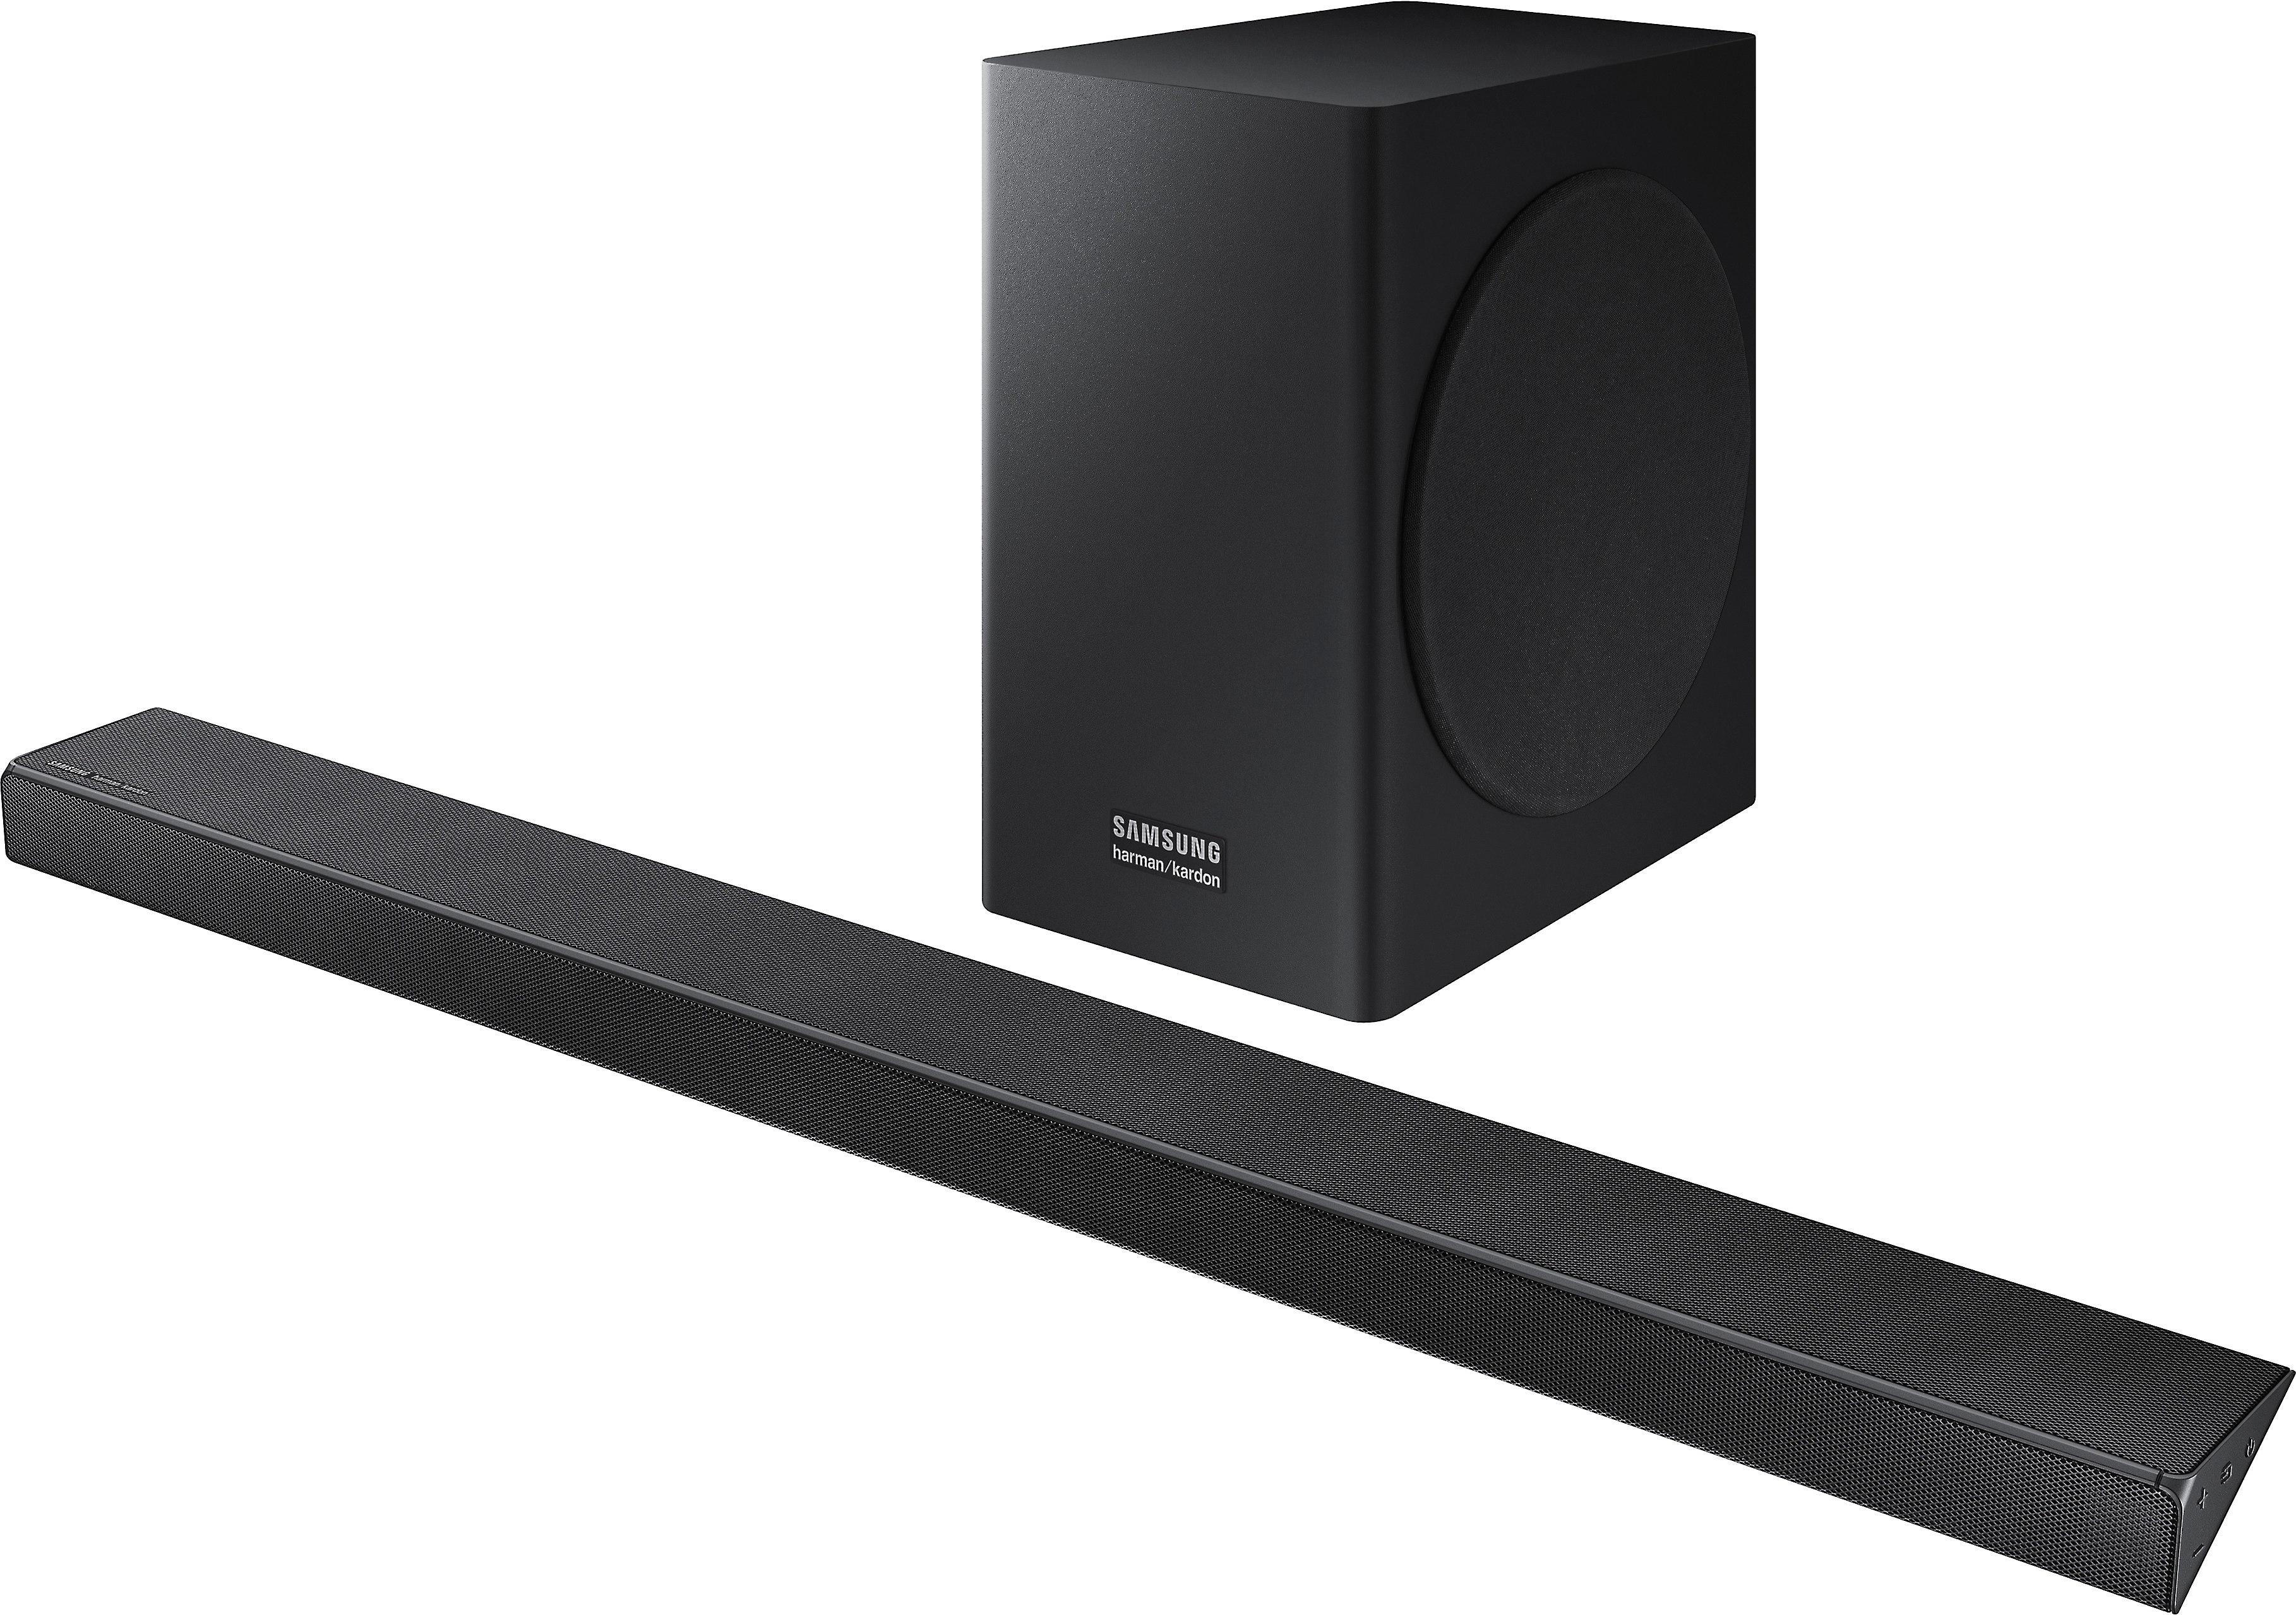 Samsung/Harman Kardon HW-Q60R